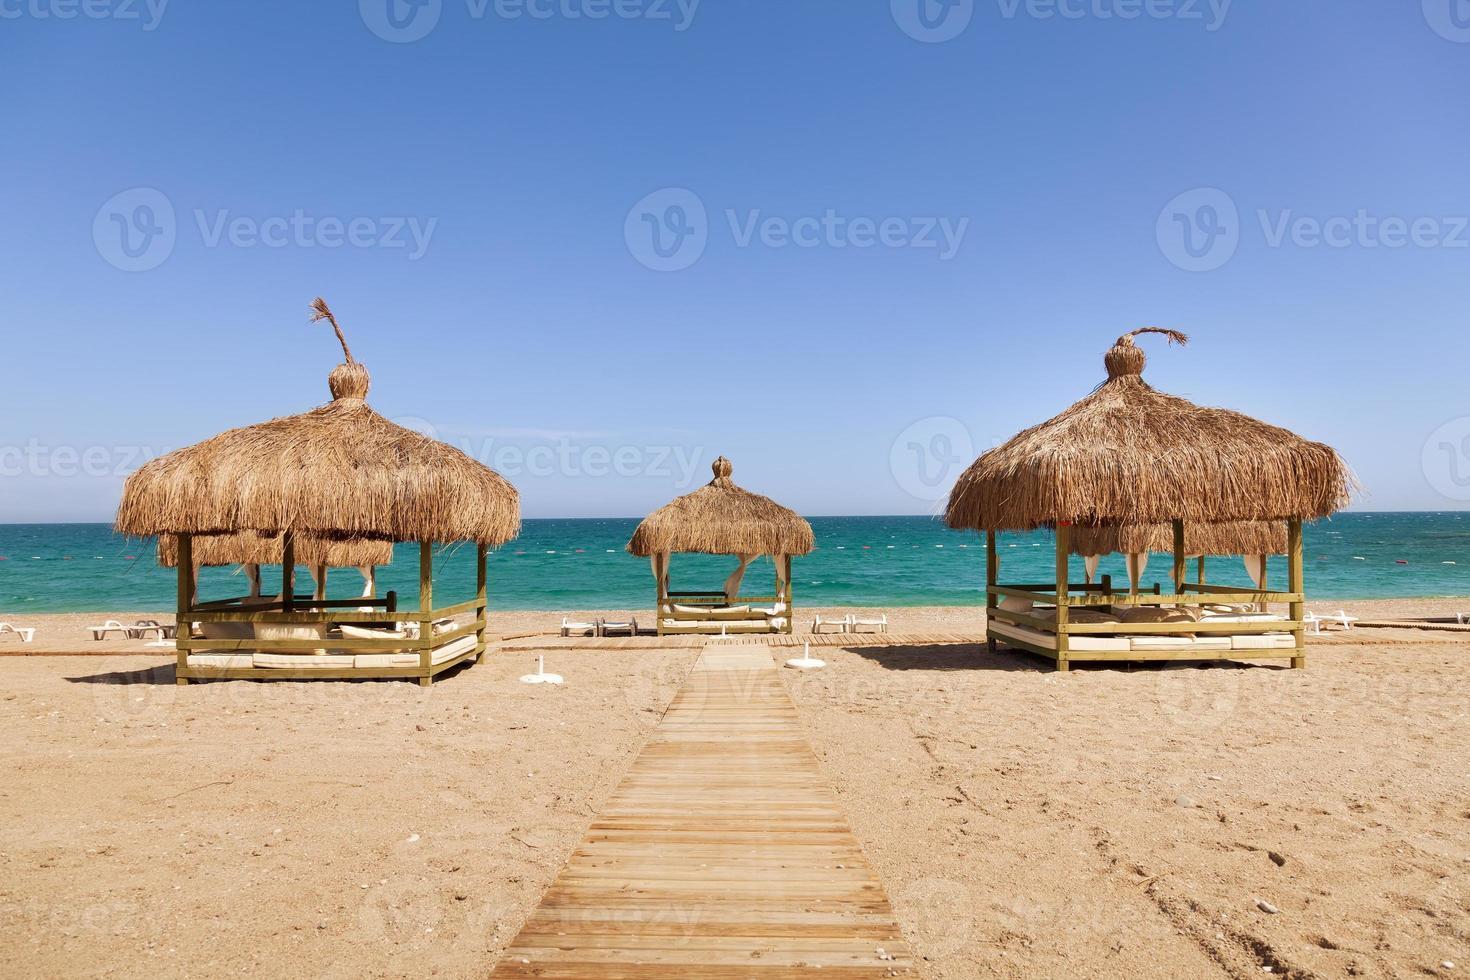 strandlounge op het strand foto